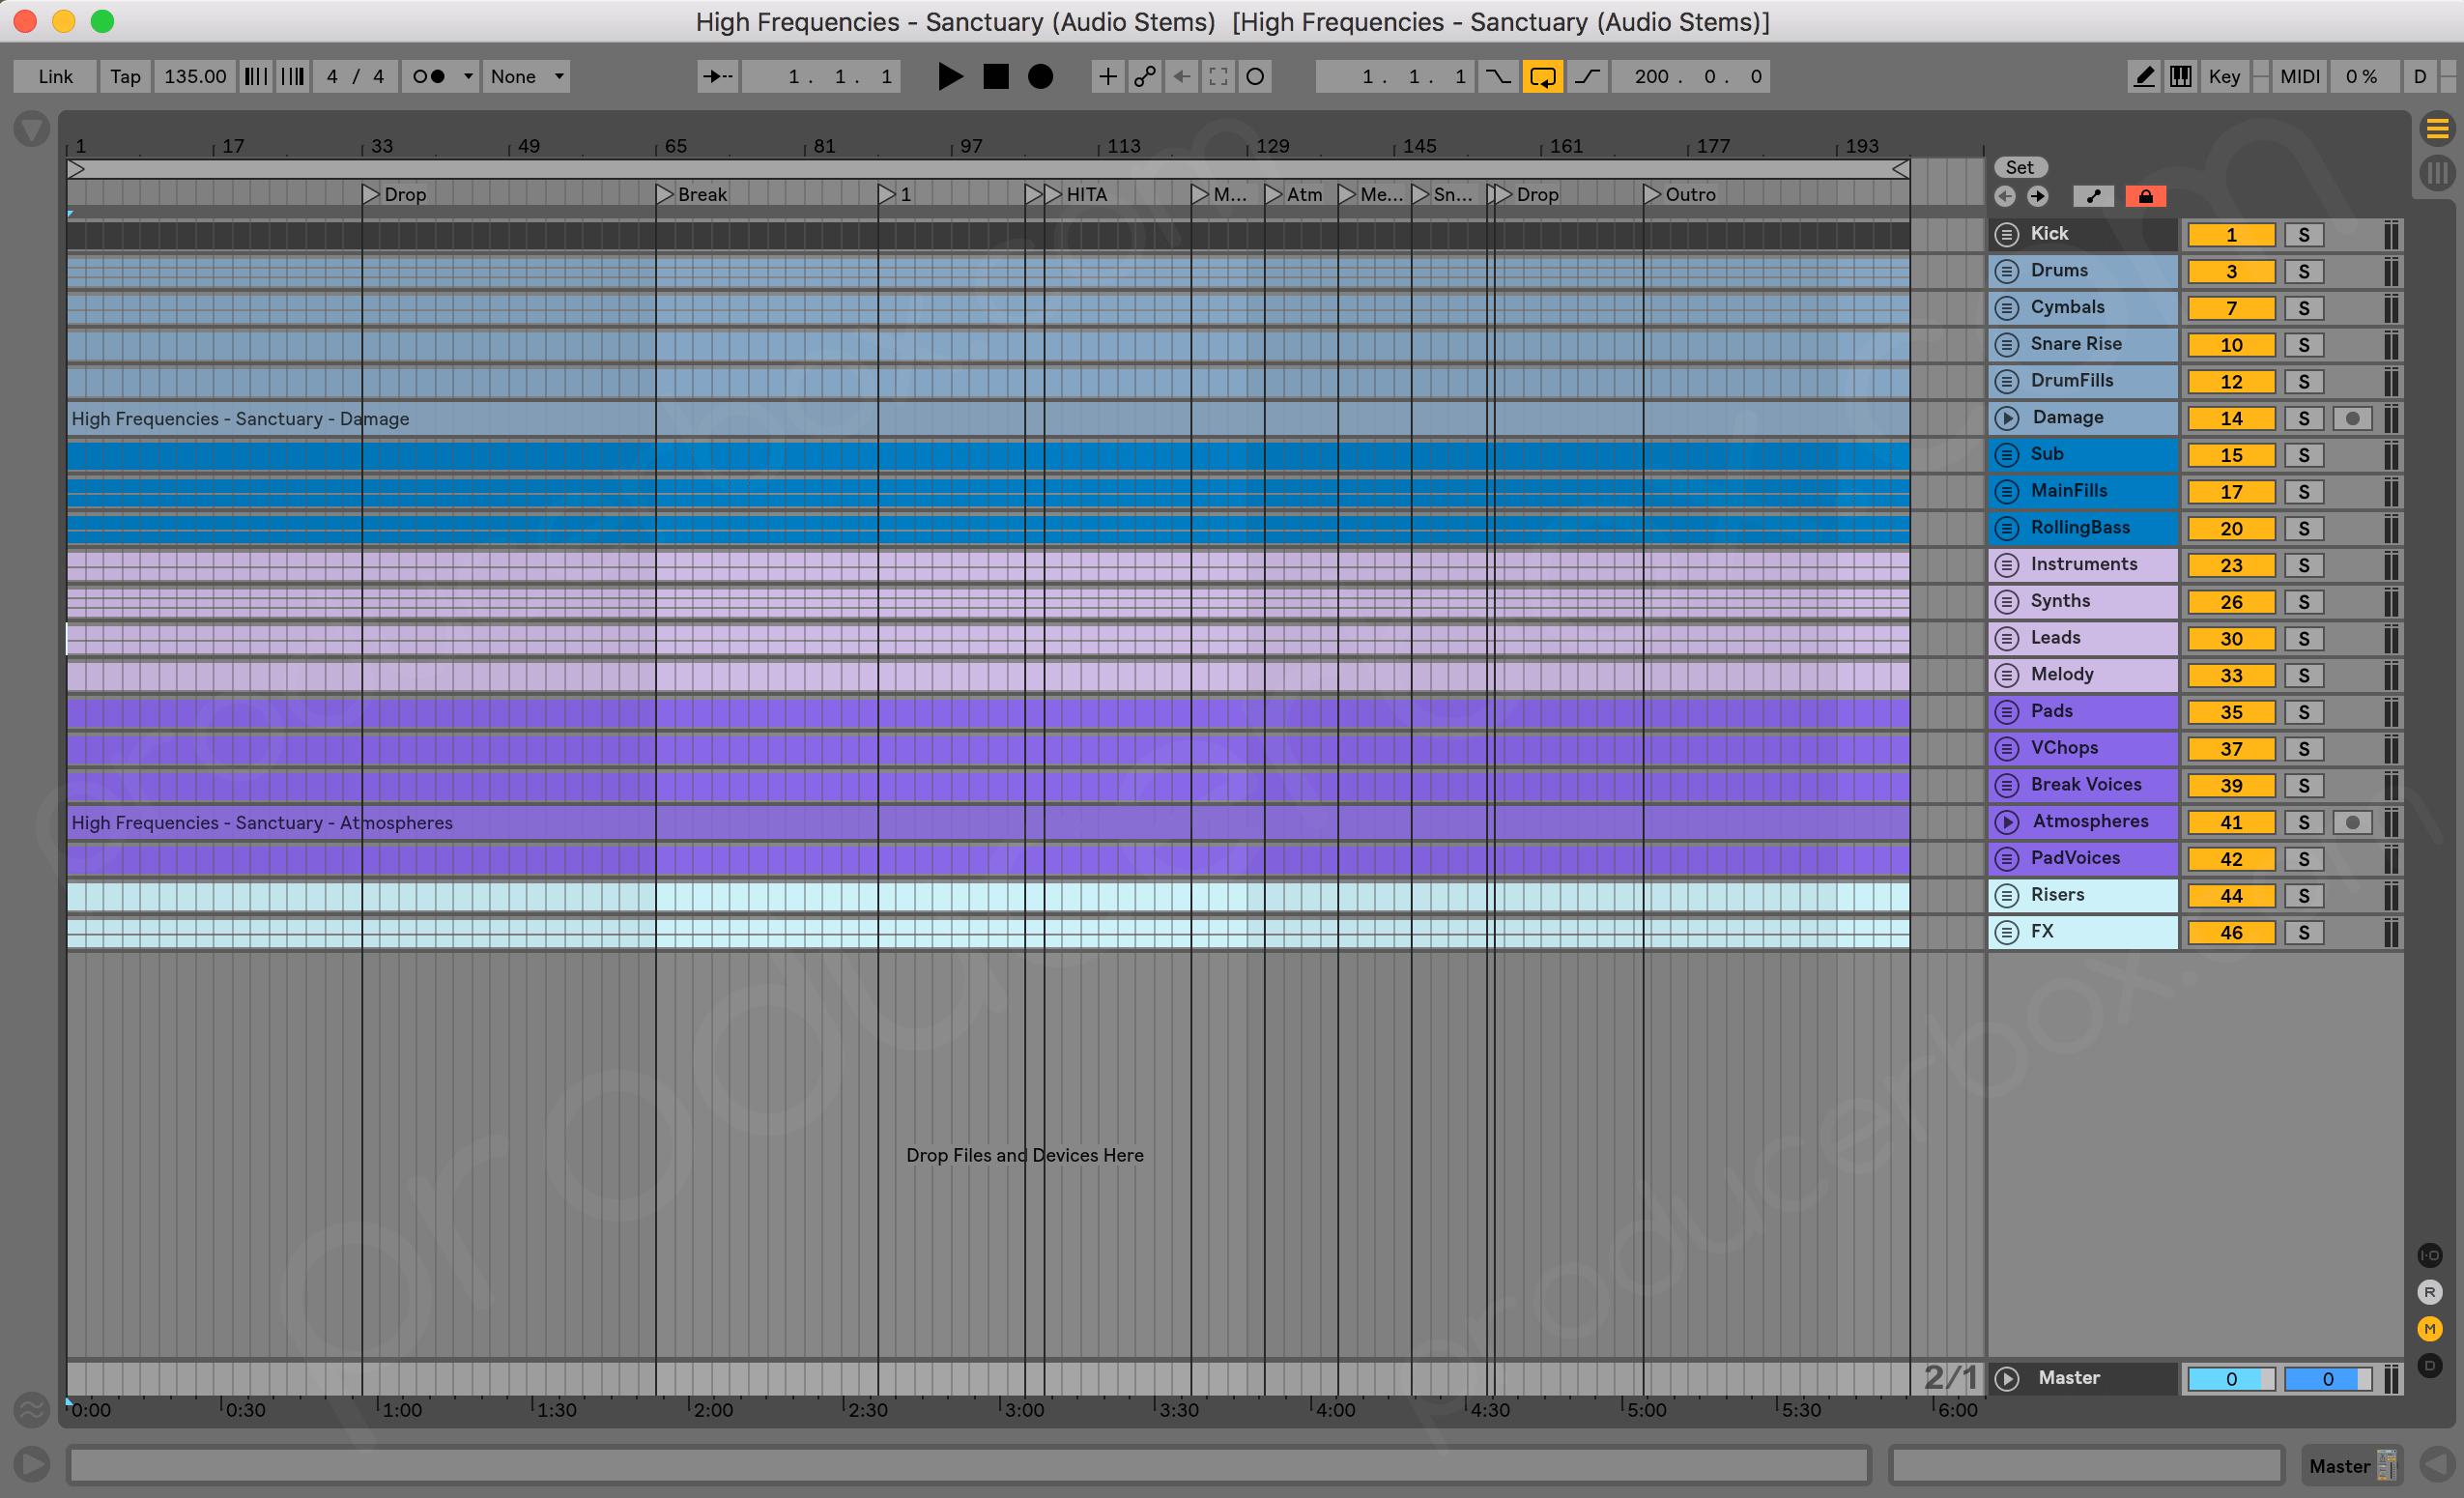 Sanctuary - Uplifting Trance Audio Stems Template (FSOE, ASOT Style